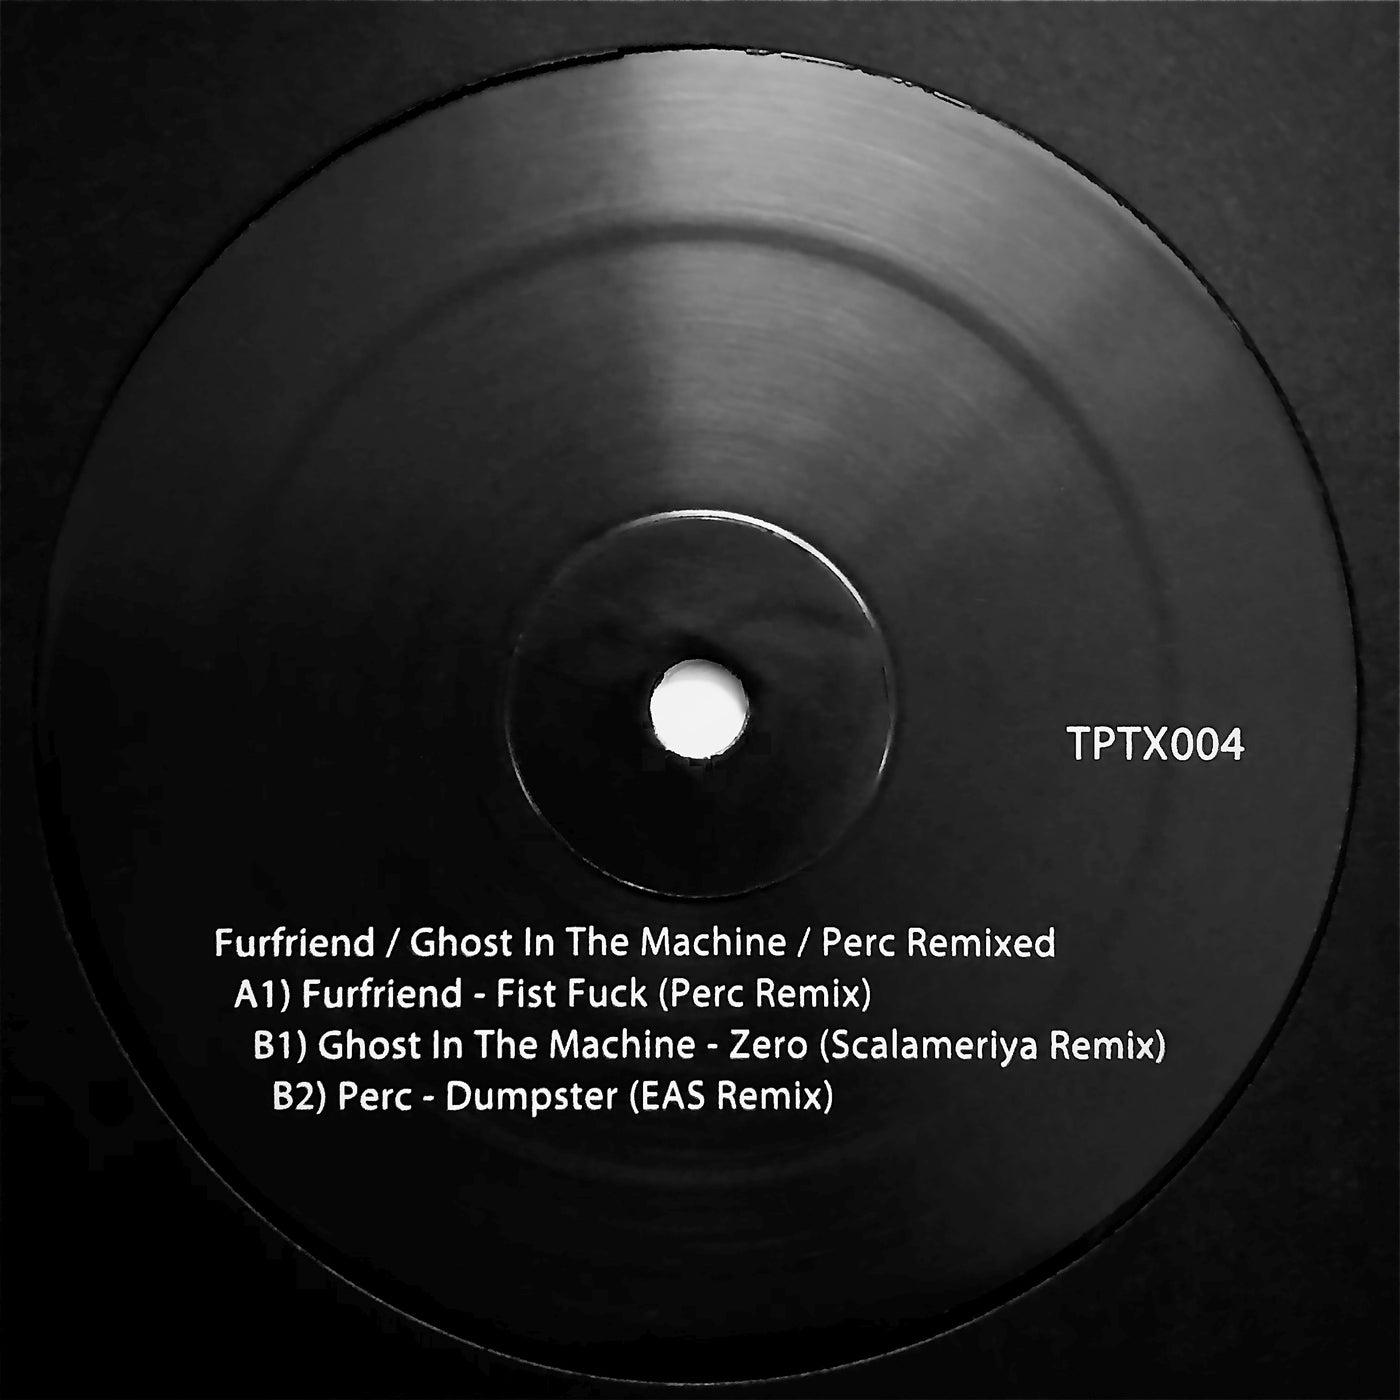 Dumpster (EAS Remix)